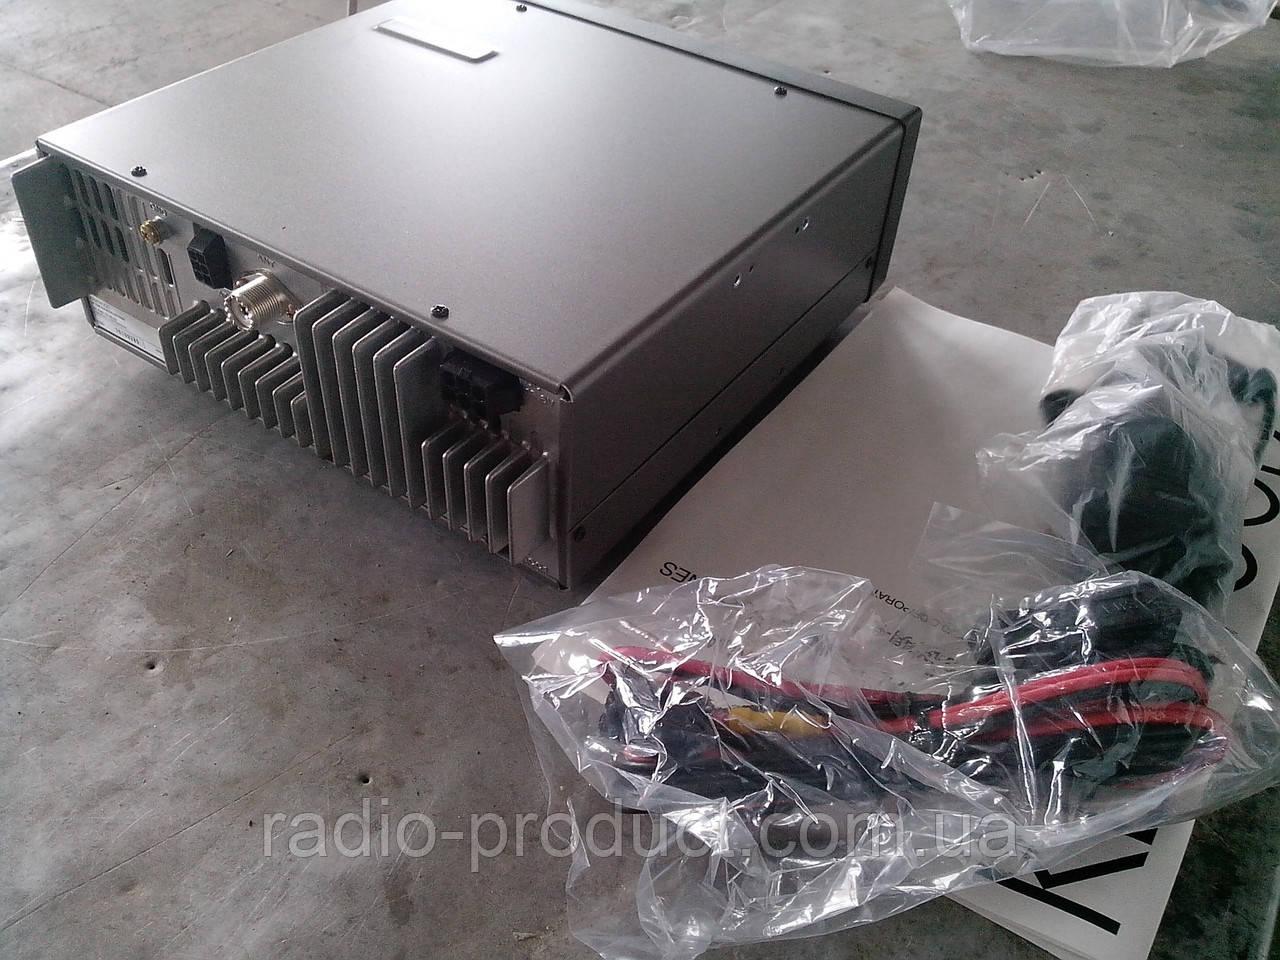 TRC-80 - CQHAM.RU Обзоры радиоаппаратуры